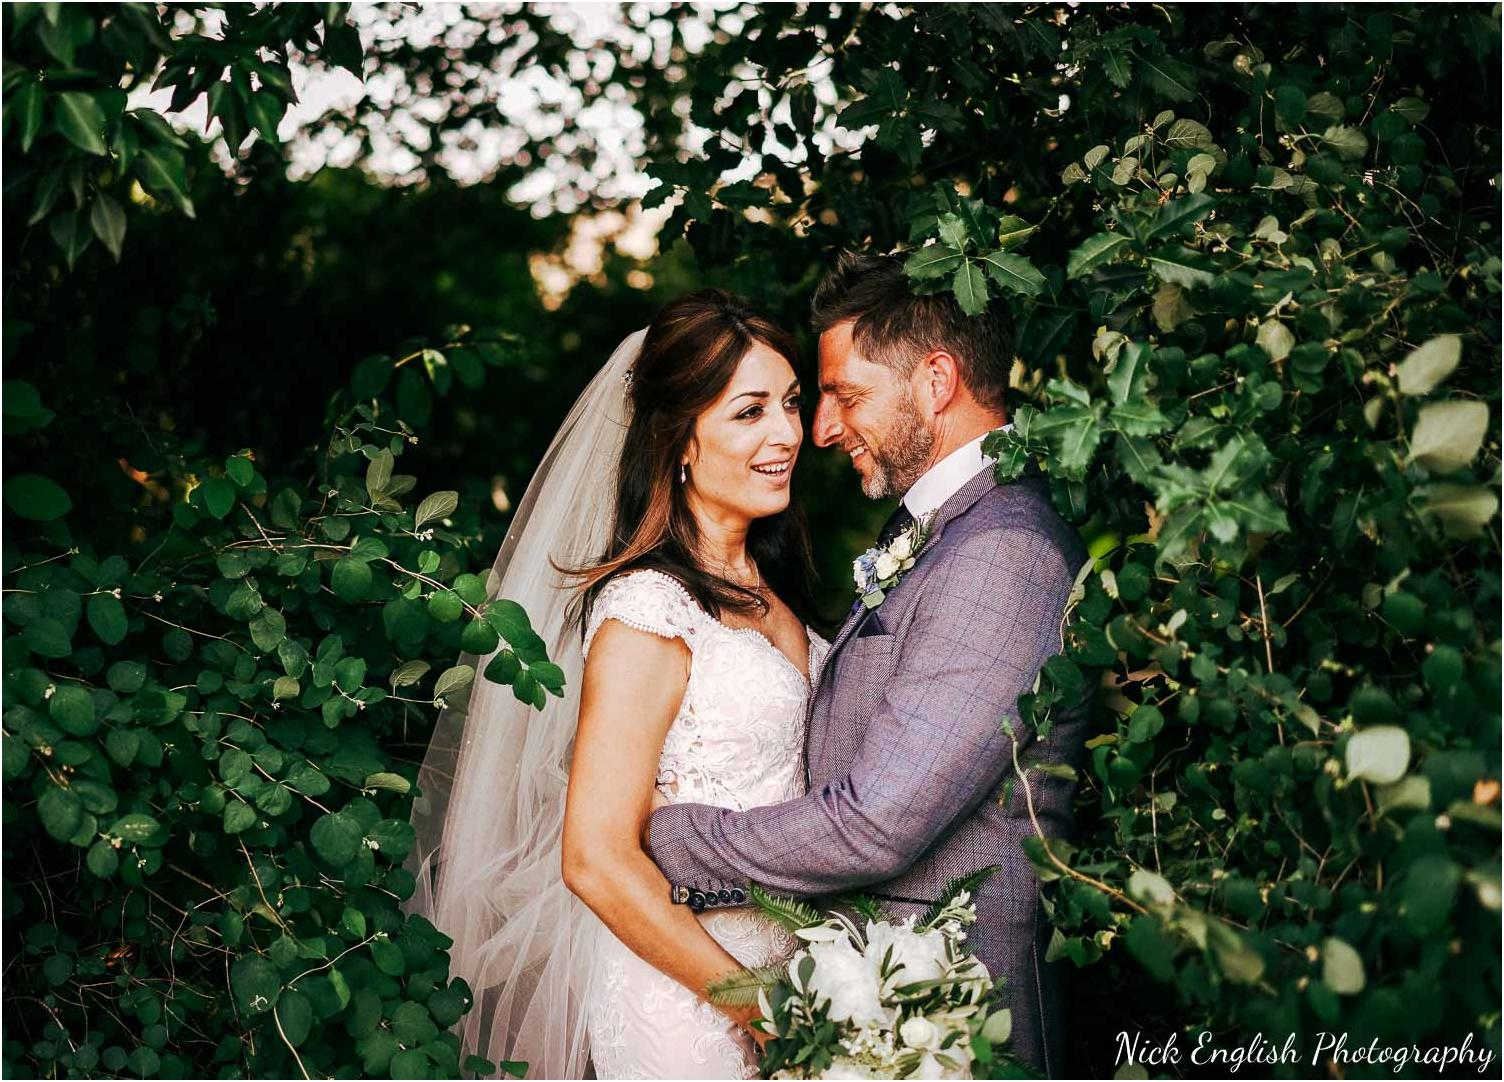 Mitton_Hall_Wedding_Photographer-72.jpg